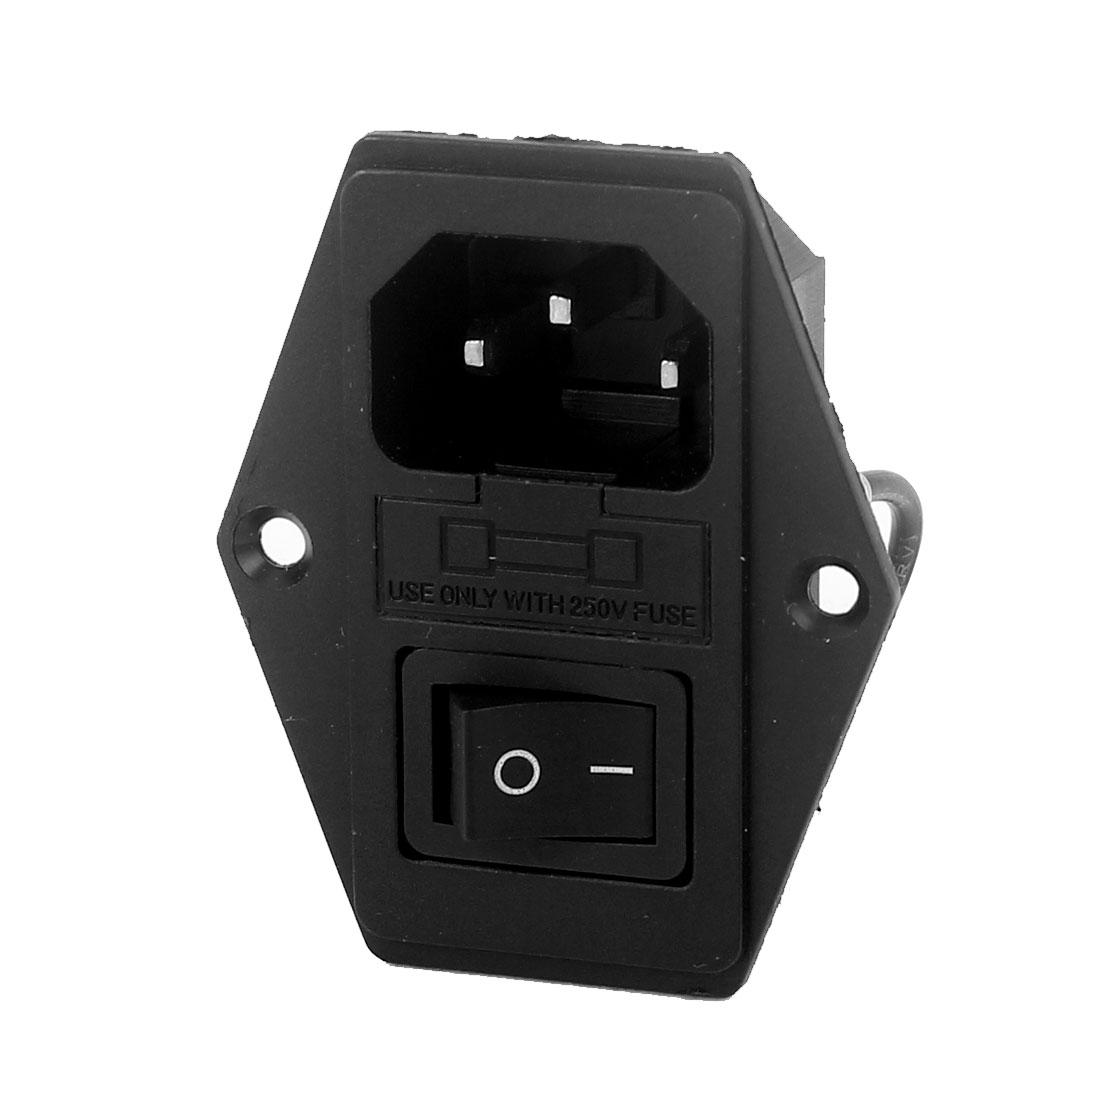 AC 250V 10A SPDT IEC320 C14 Rocker Boat Switch Fuse Power Inlet Socket